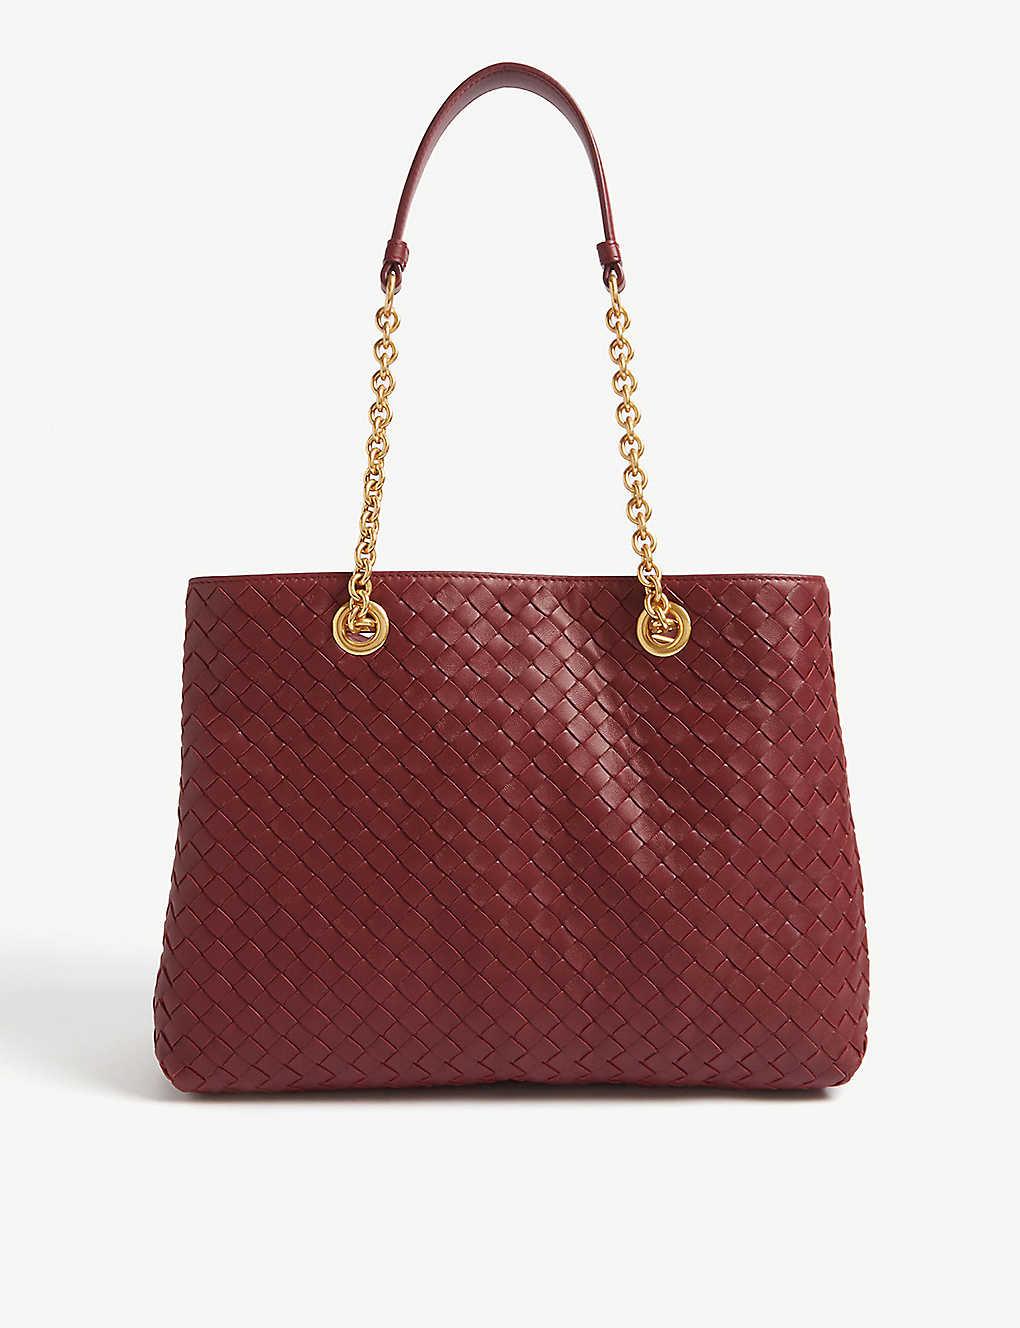 7c79d76ec BOTTEGA VENETA - Woven leather tote bag | Selfridges.com